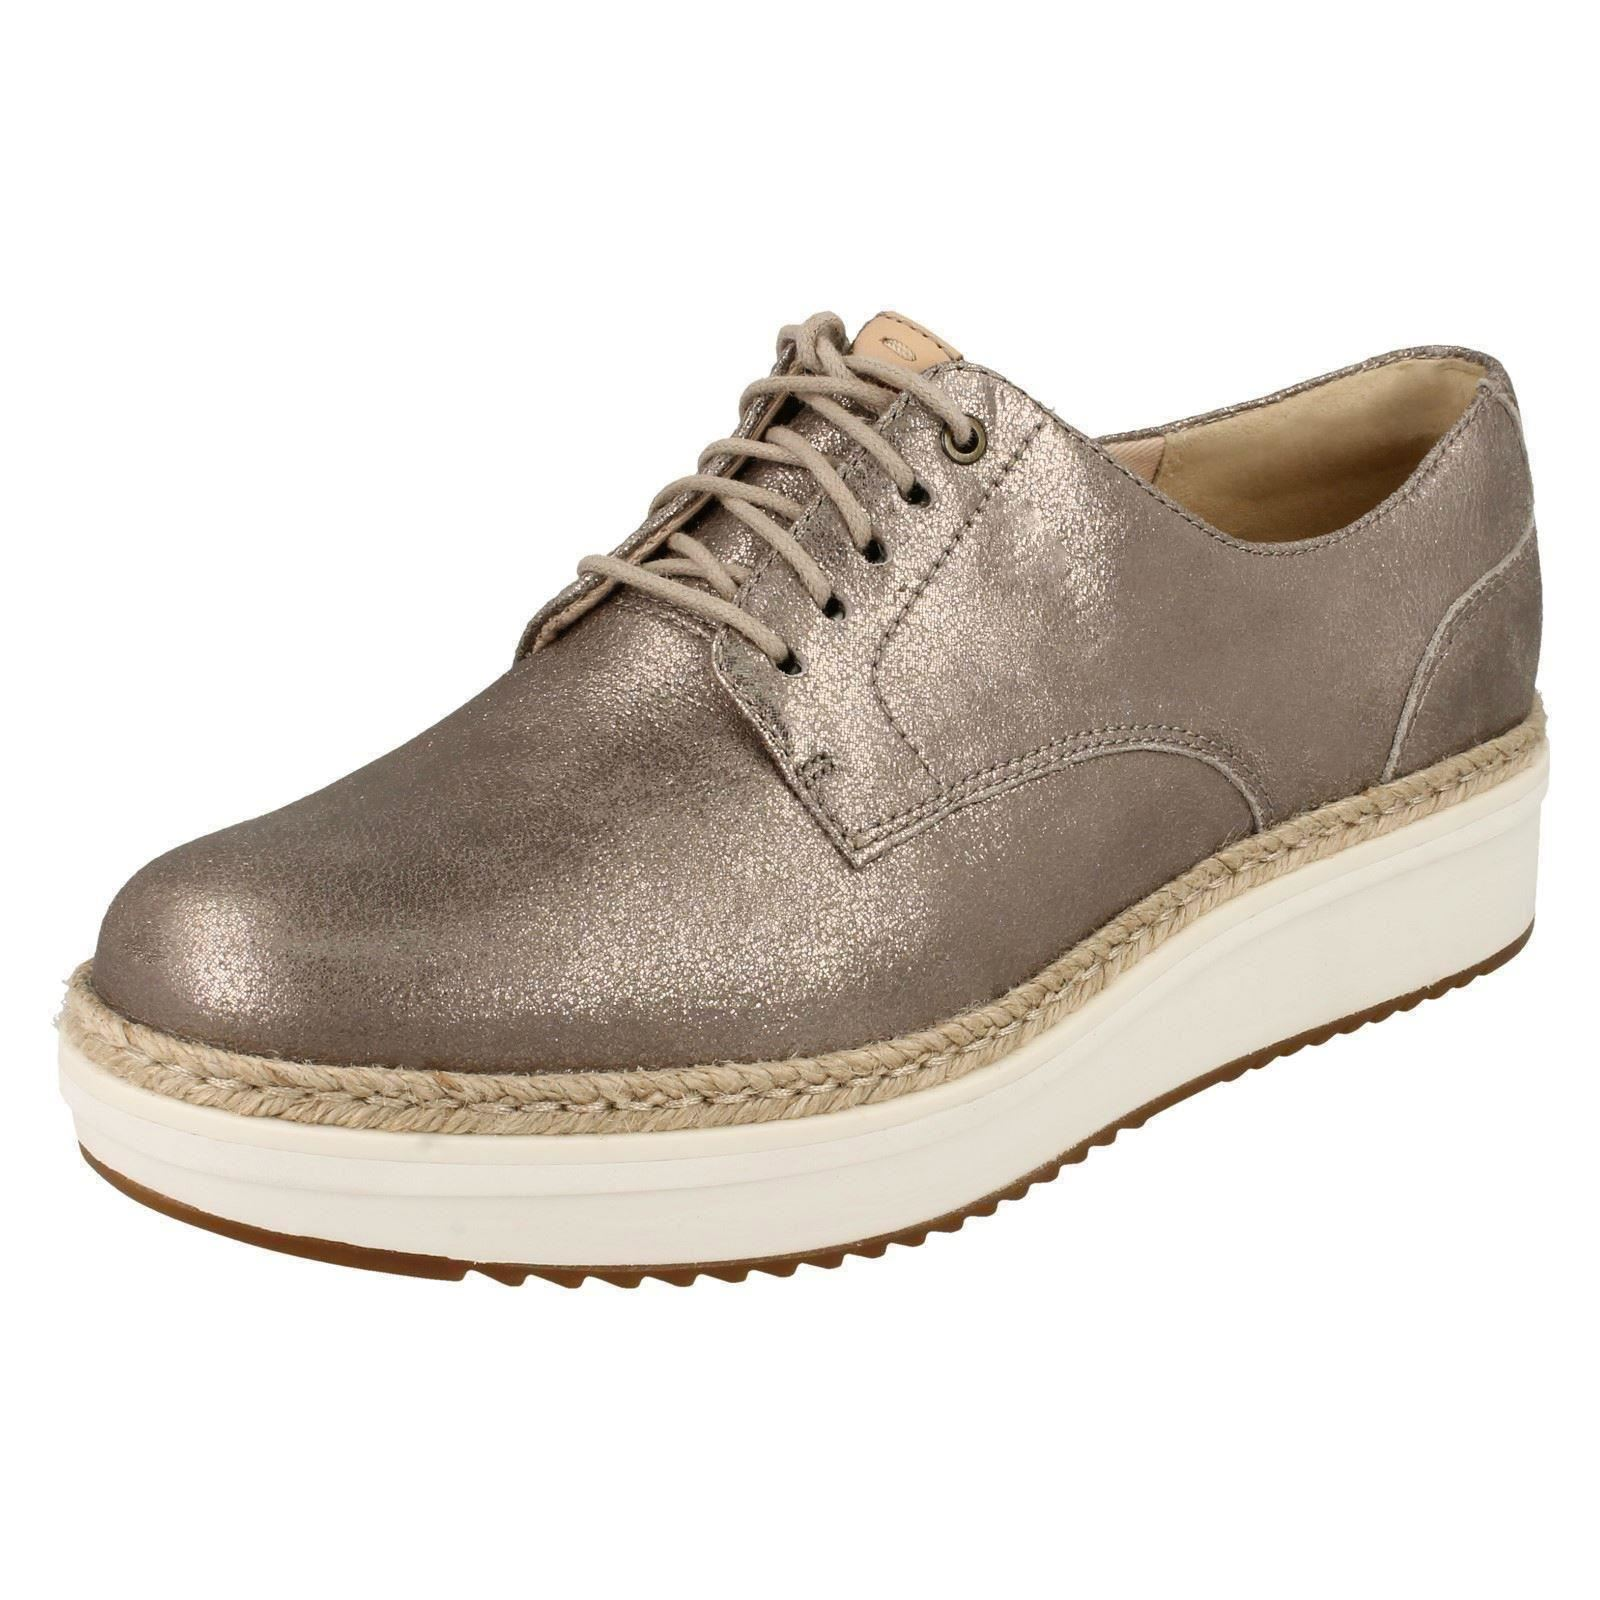 Clarks Mujer Zapato Oxford  zapatos  RHEA Estilo - teadale RHEA  998b0f